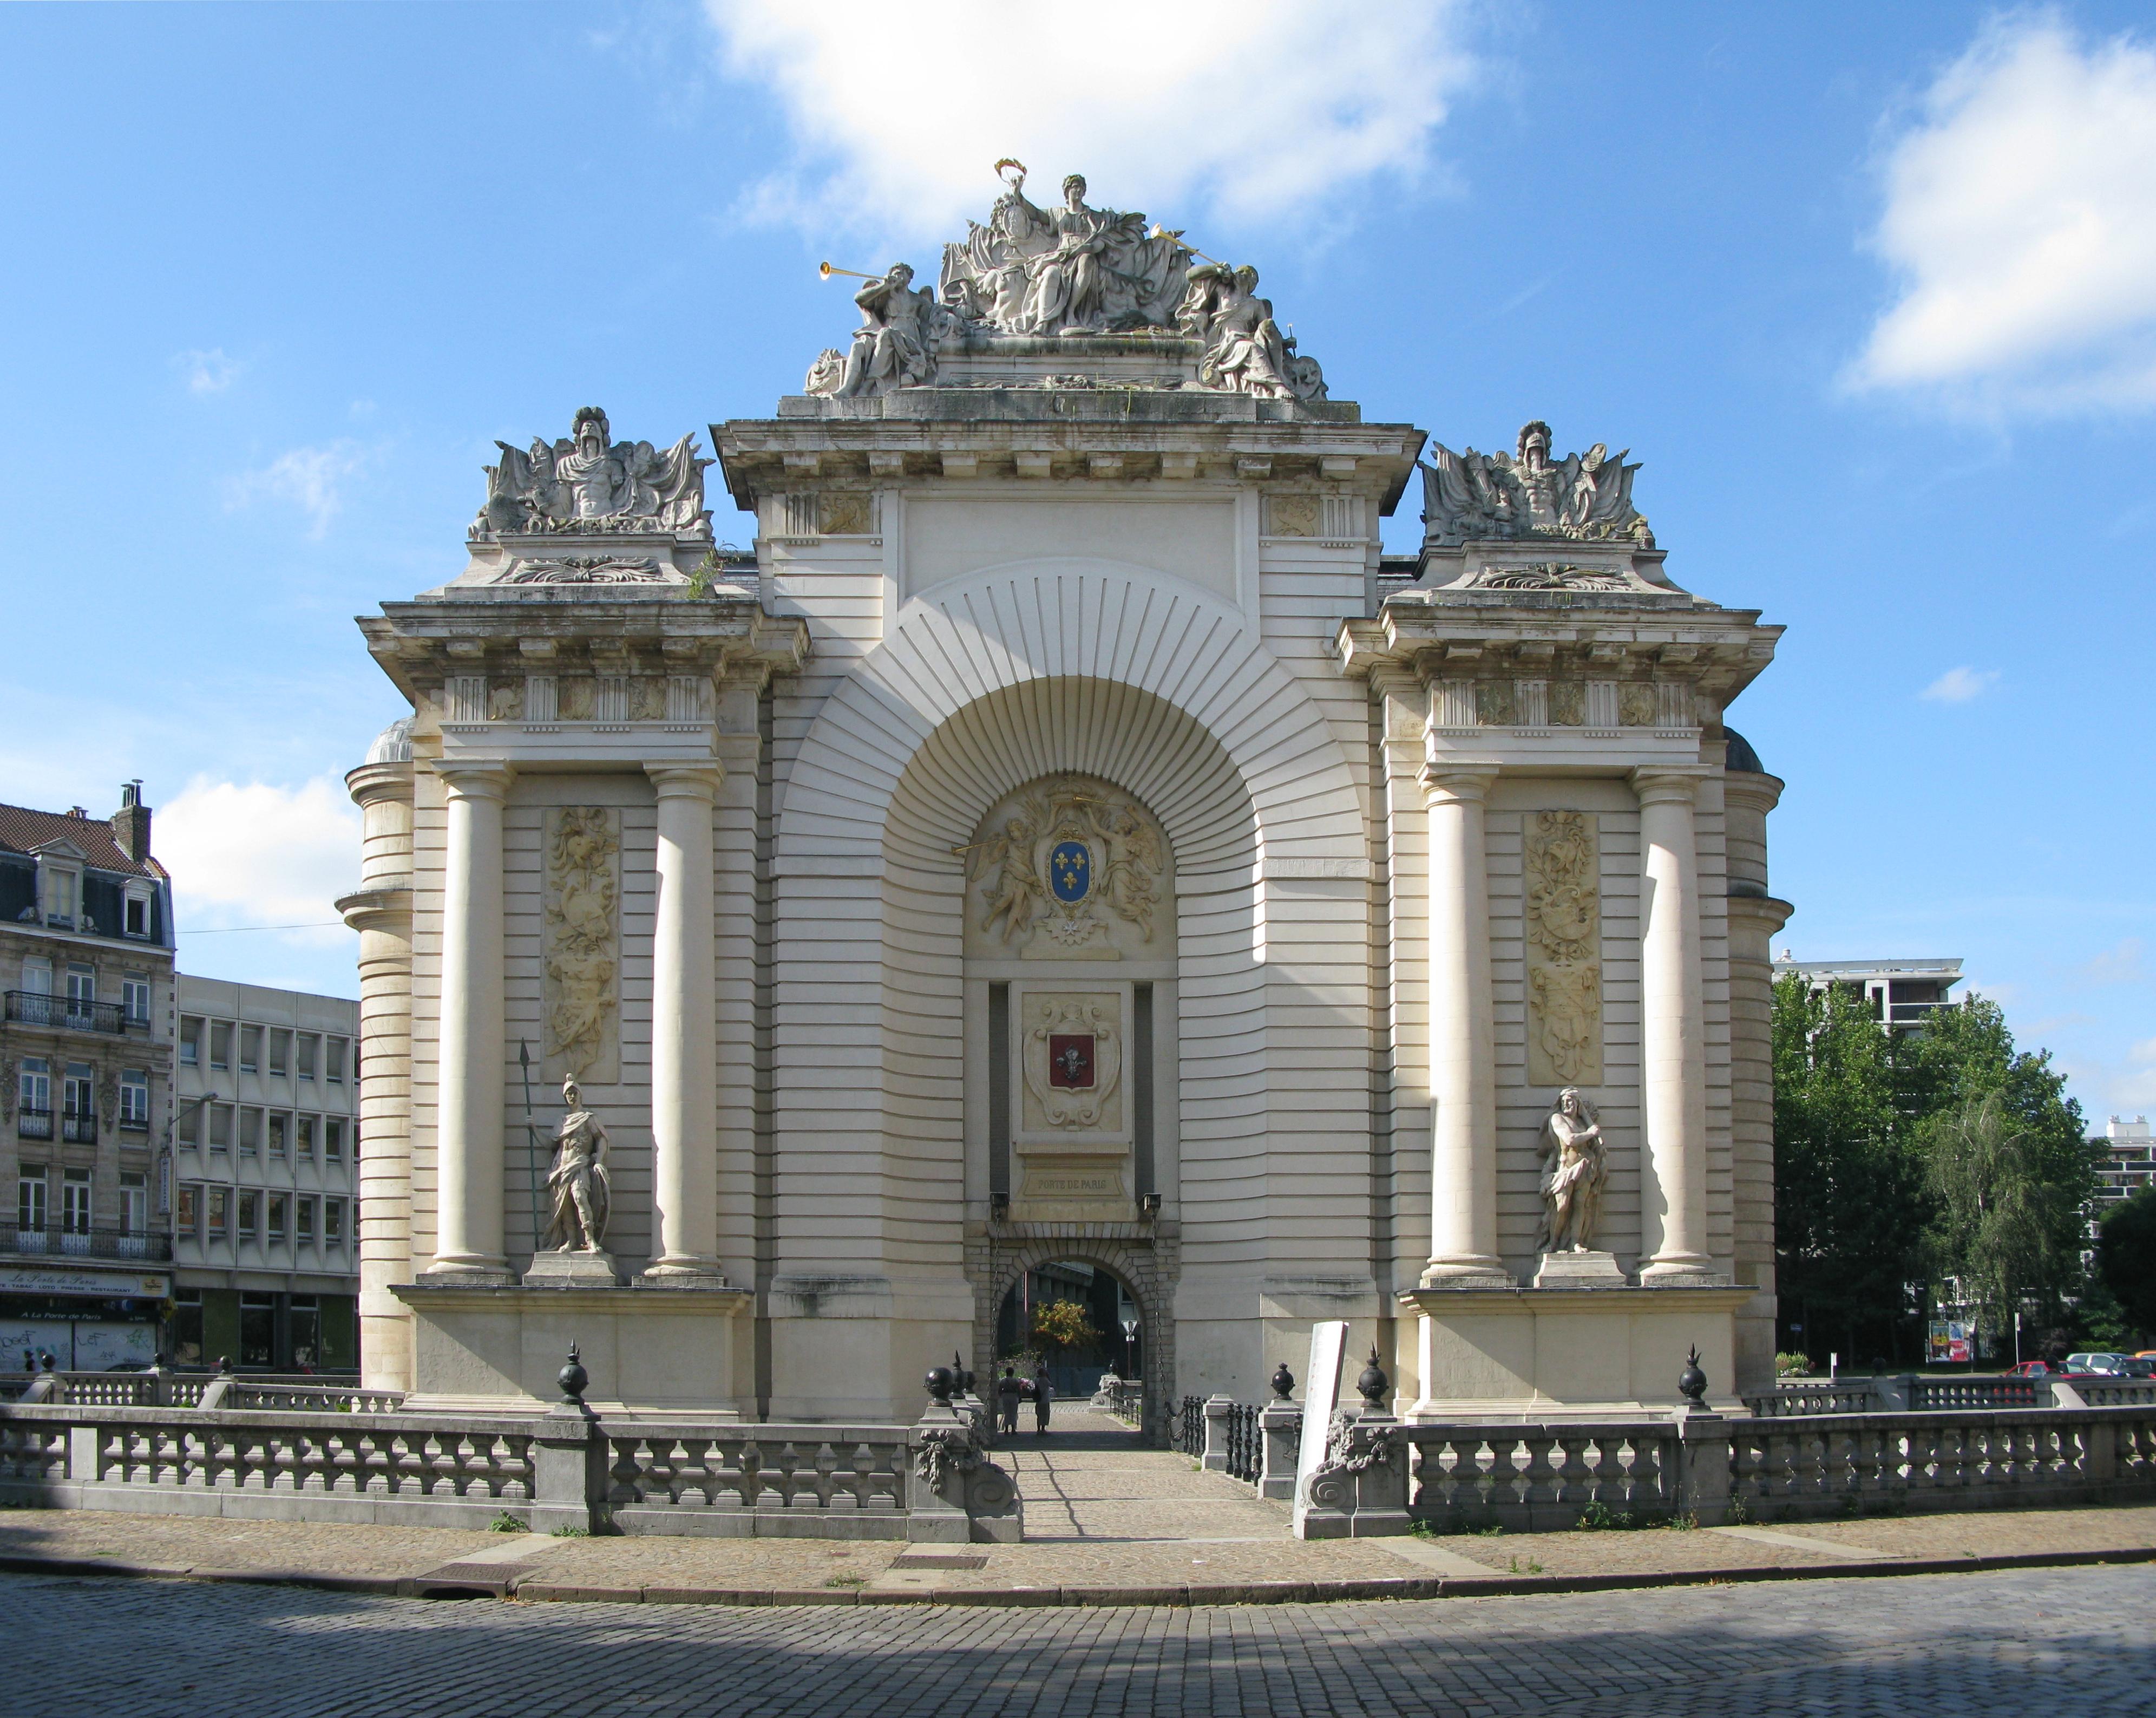 File Jielbeaumadier Porte De Paris Lille 2009 Jpg Wikimedia Commons